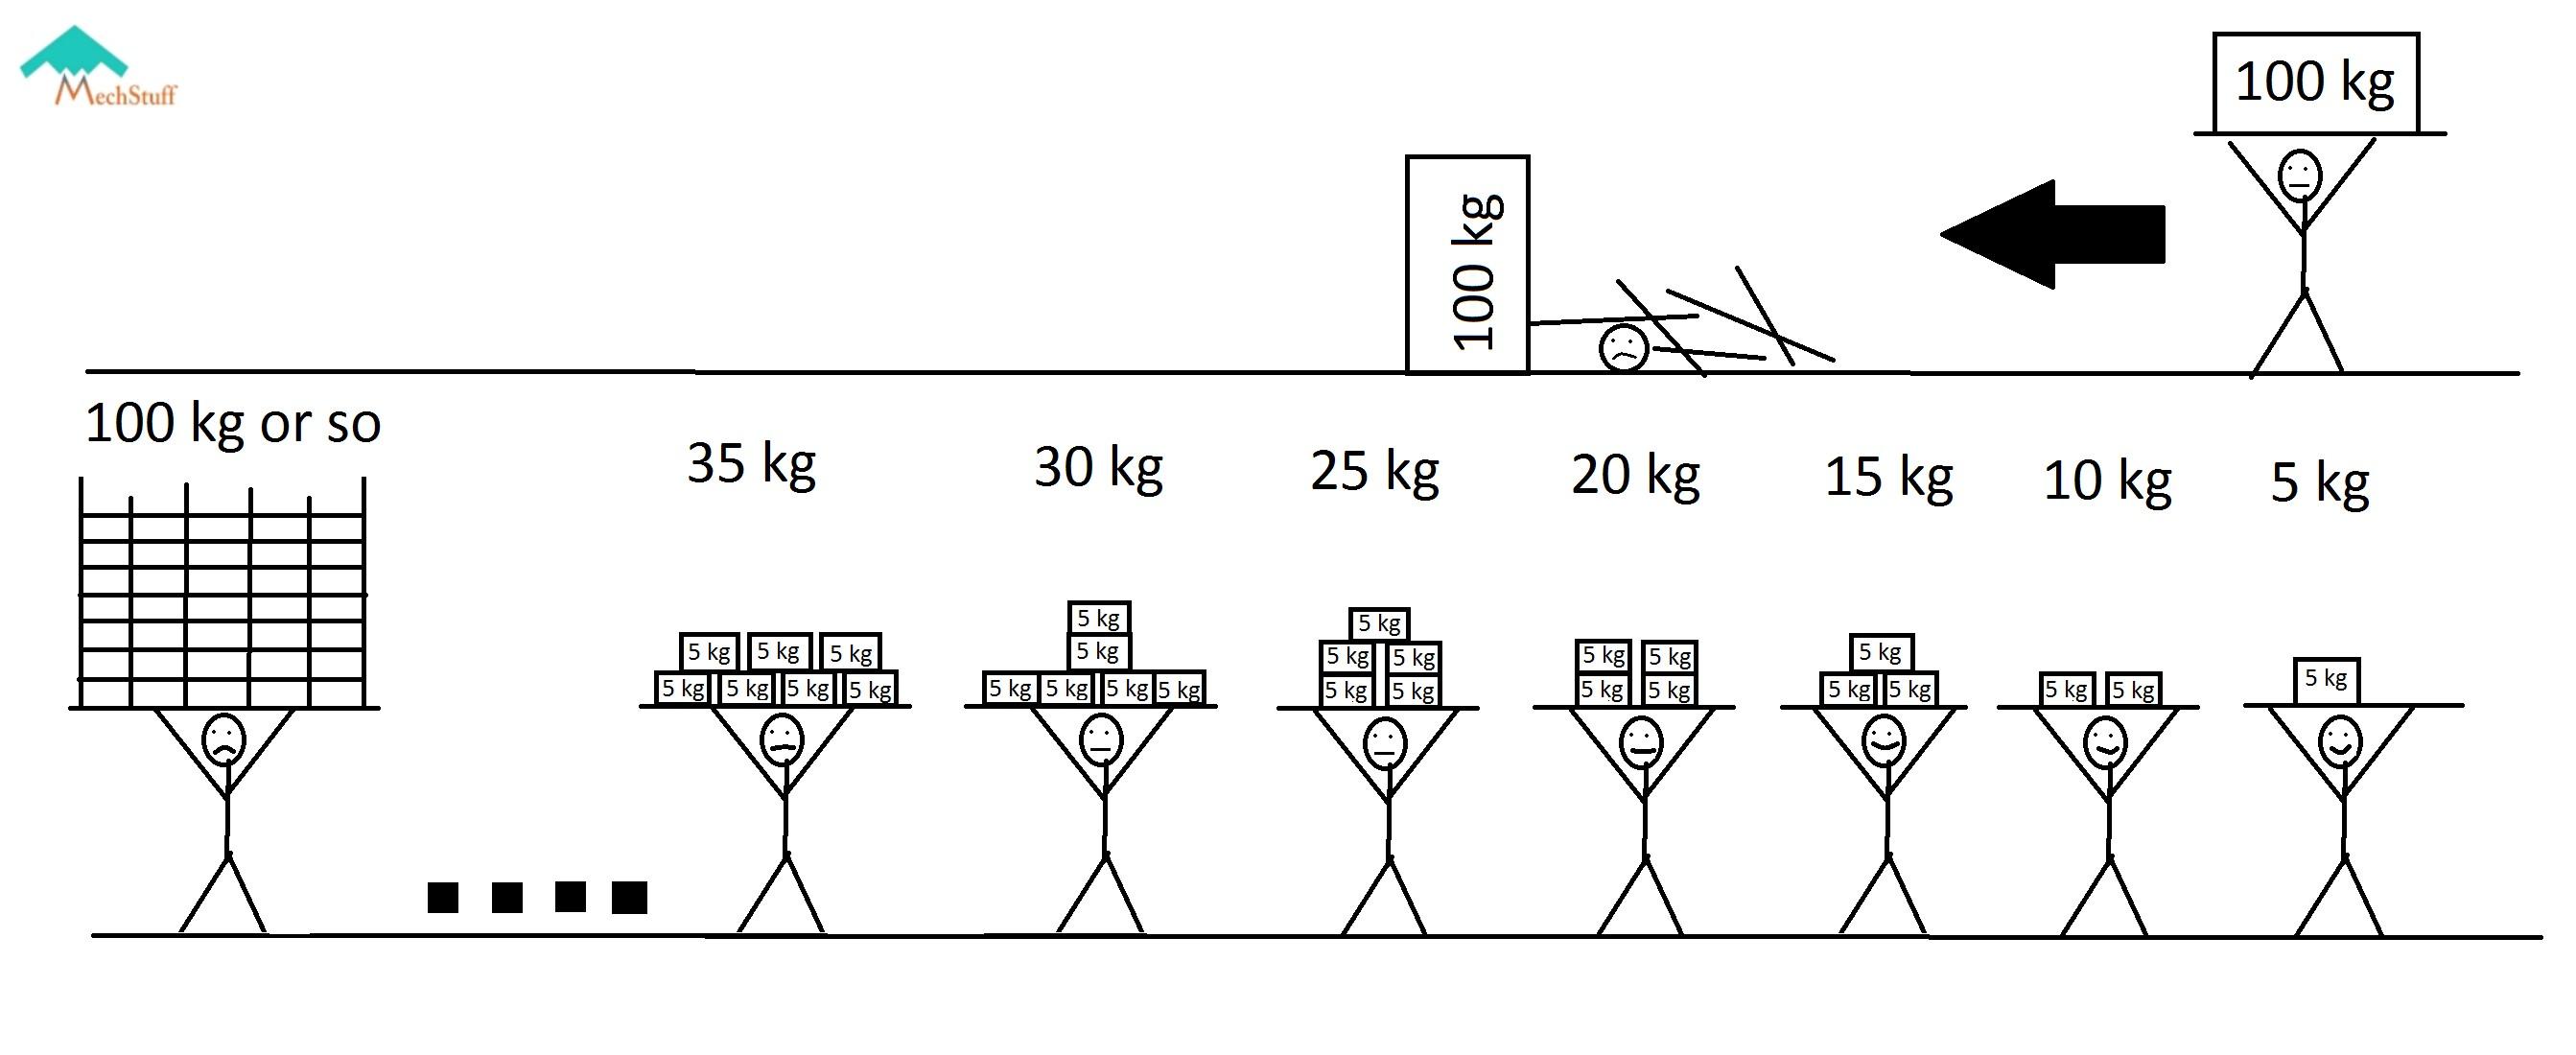 Diaphragm Clutch Diagram How Car Clutches Work Parts Function & Types Of Diaphragm Clutch Diagram